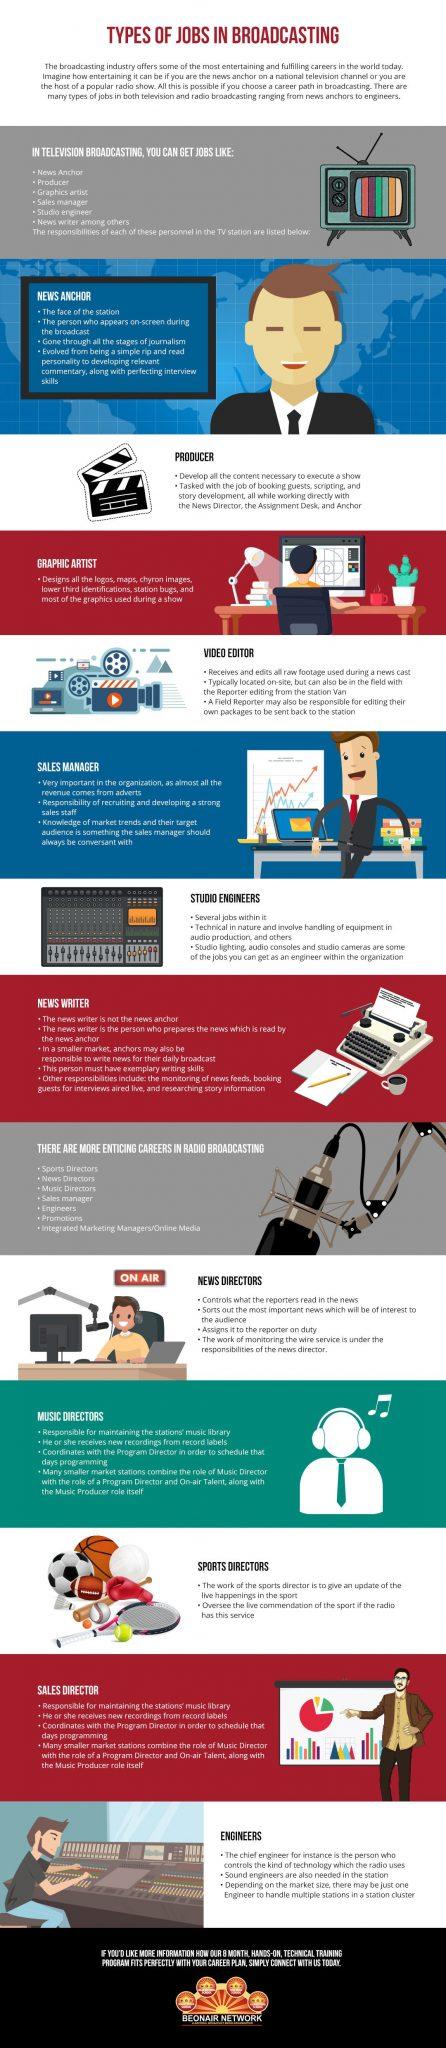 Broadcasting Jobs